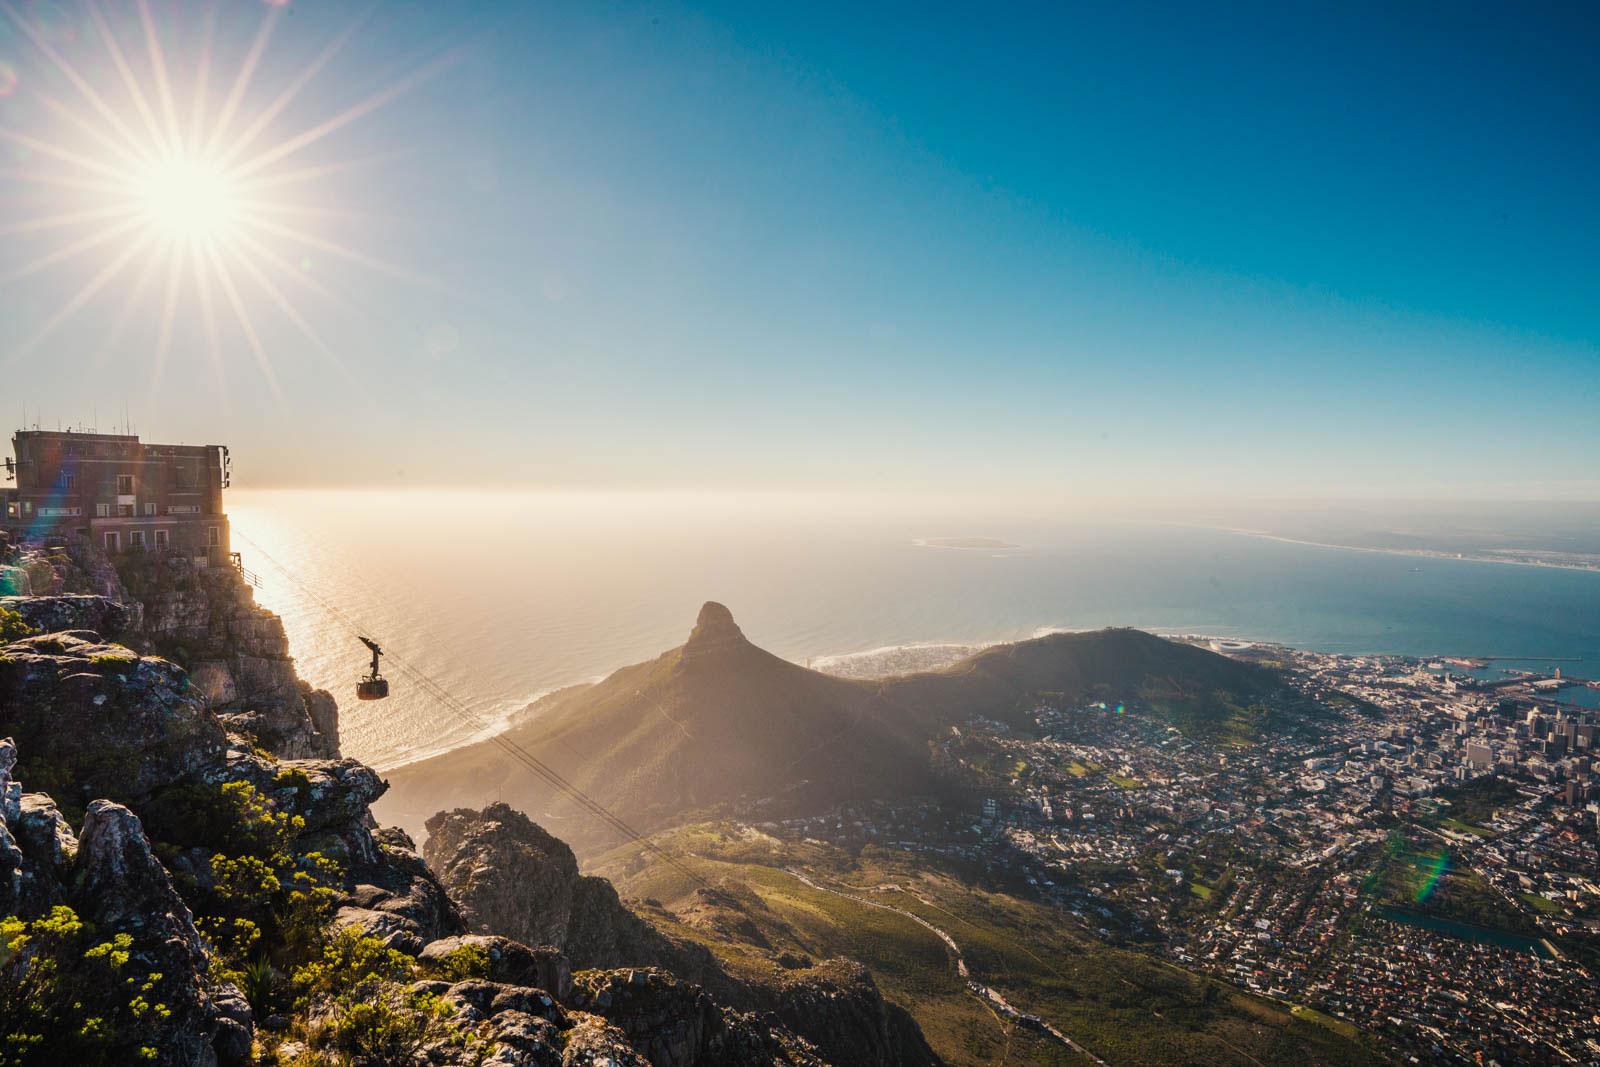 Reiseziele November Südafrika Kapstadt